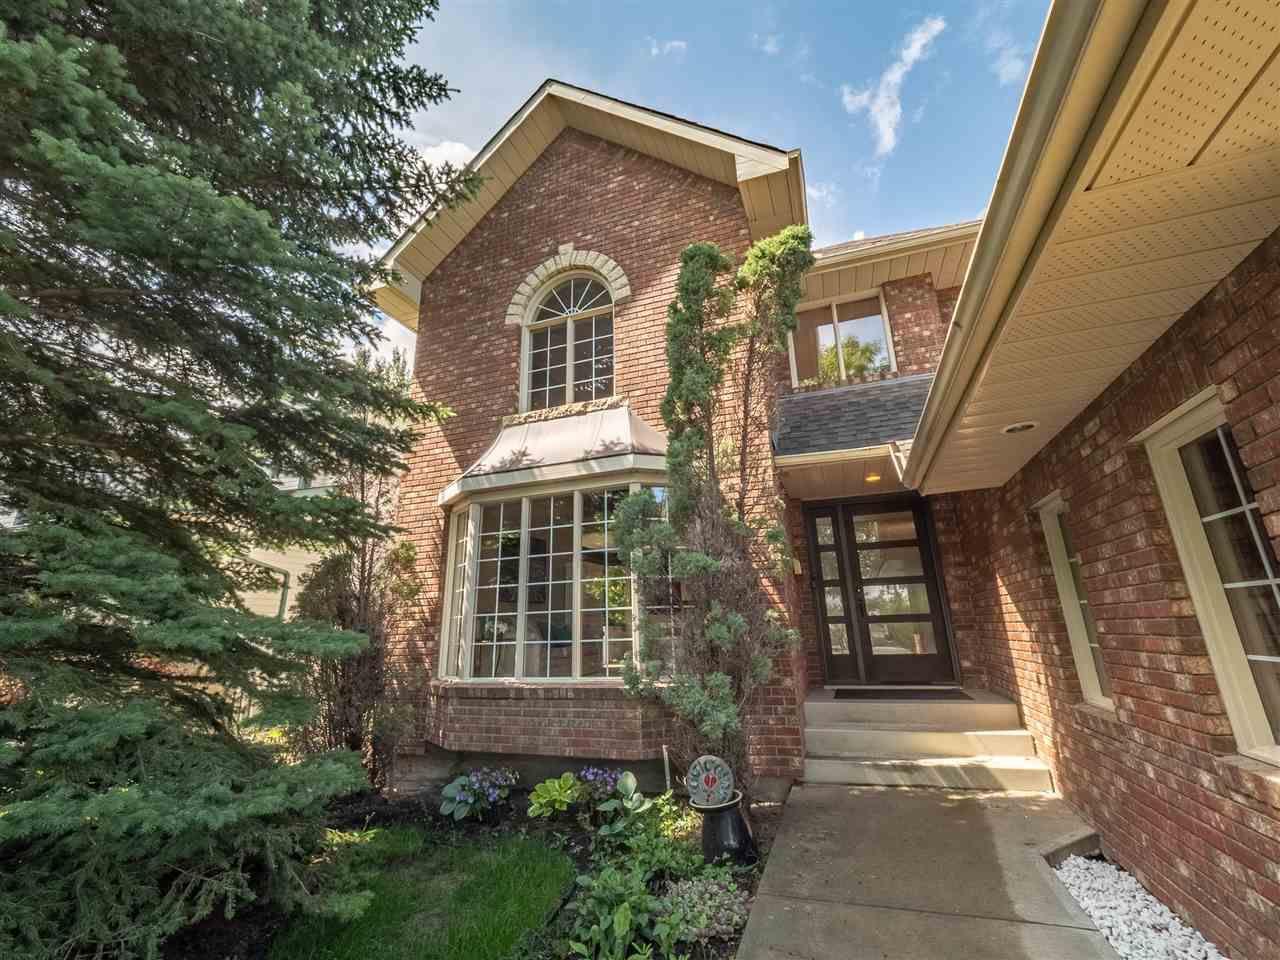 Main Photo: 6 KIRKWOOD Drive: St. Albert House for sale : MLS®# E4162852